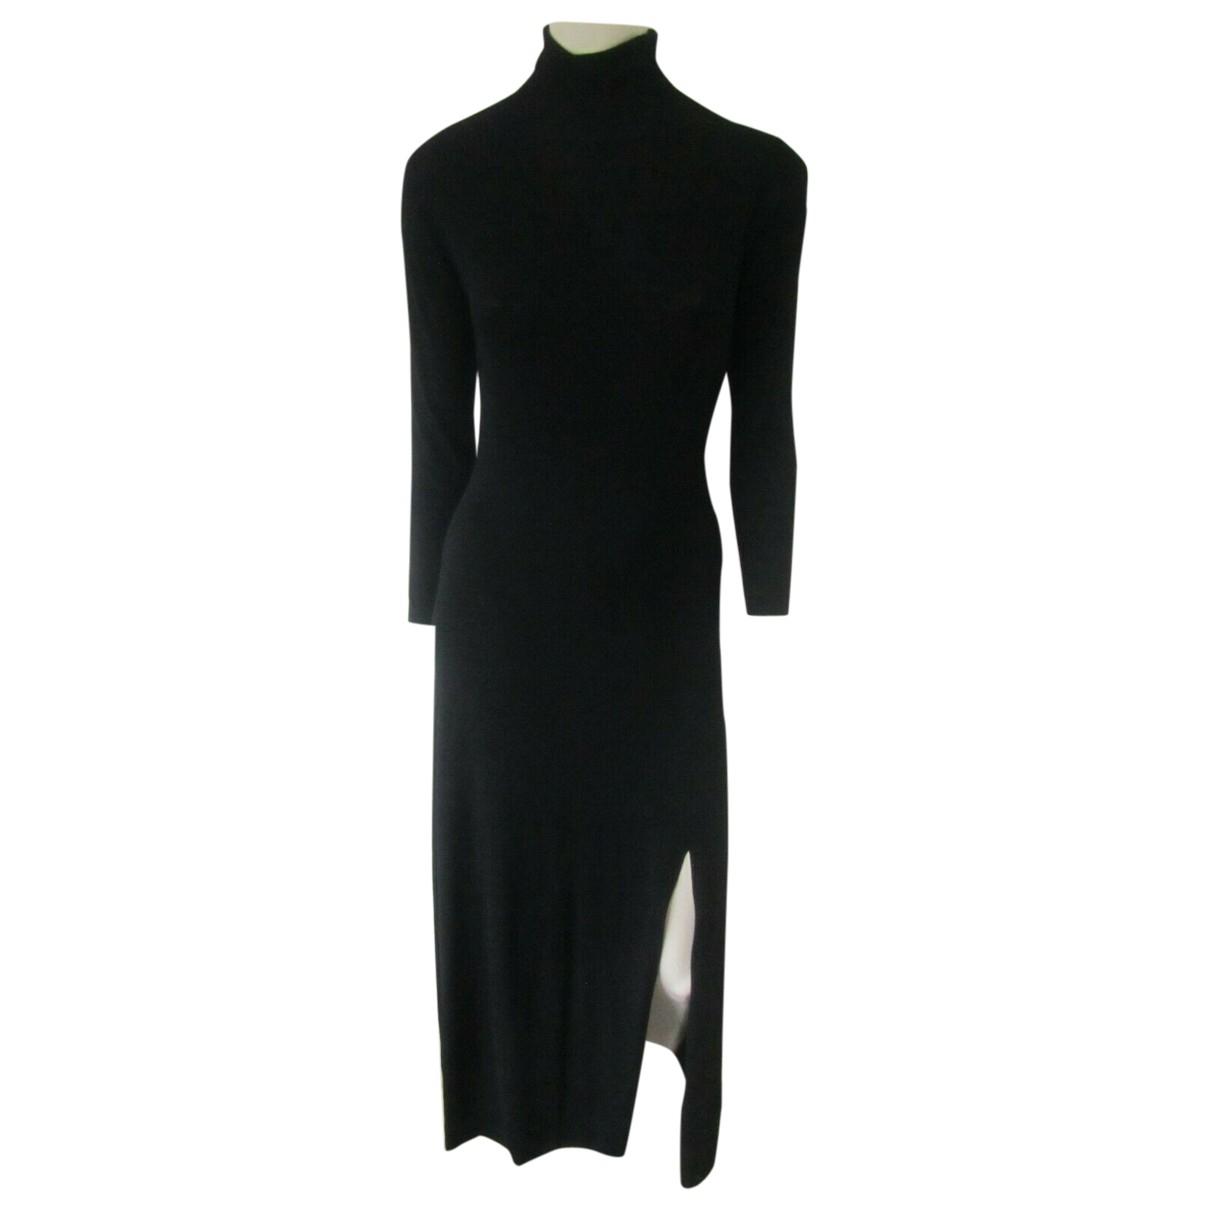 Rixo \N Black dress for Women L International